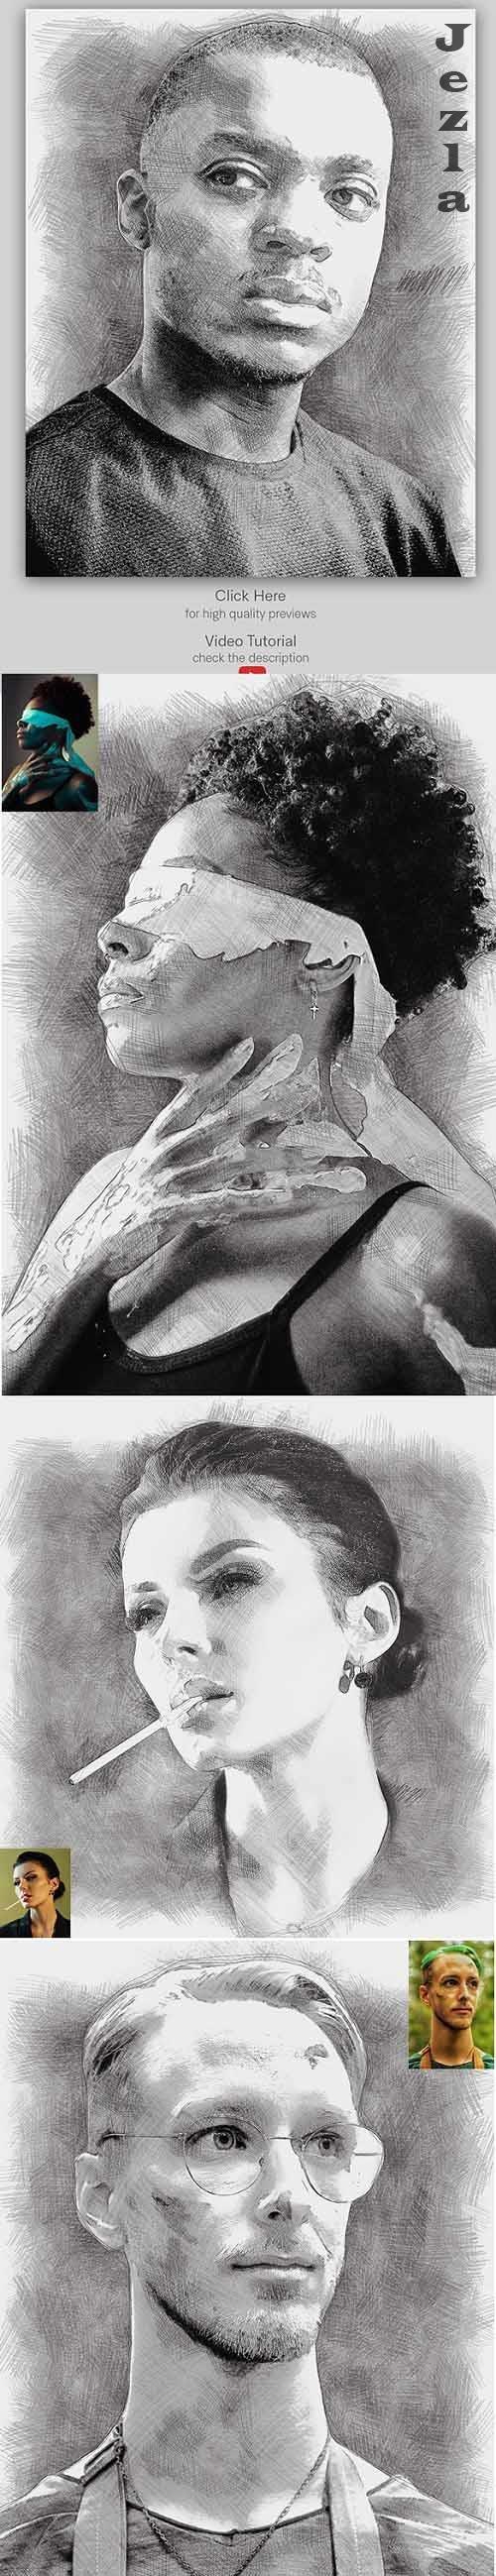 Digital Pencil Photoshop Action - 33994474